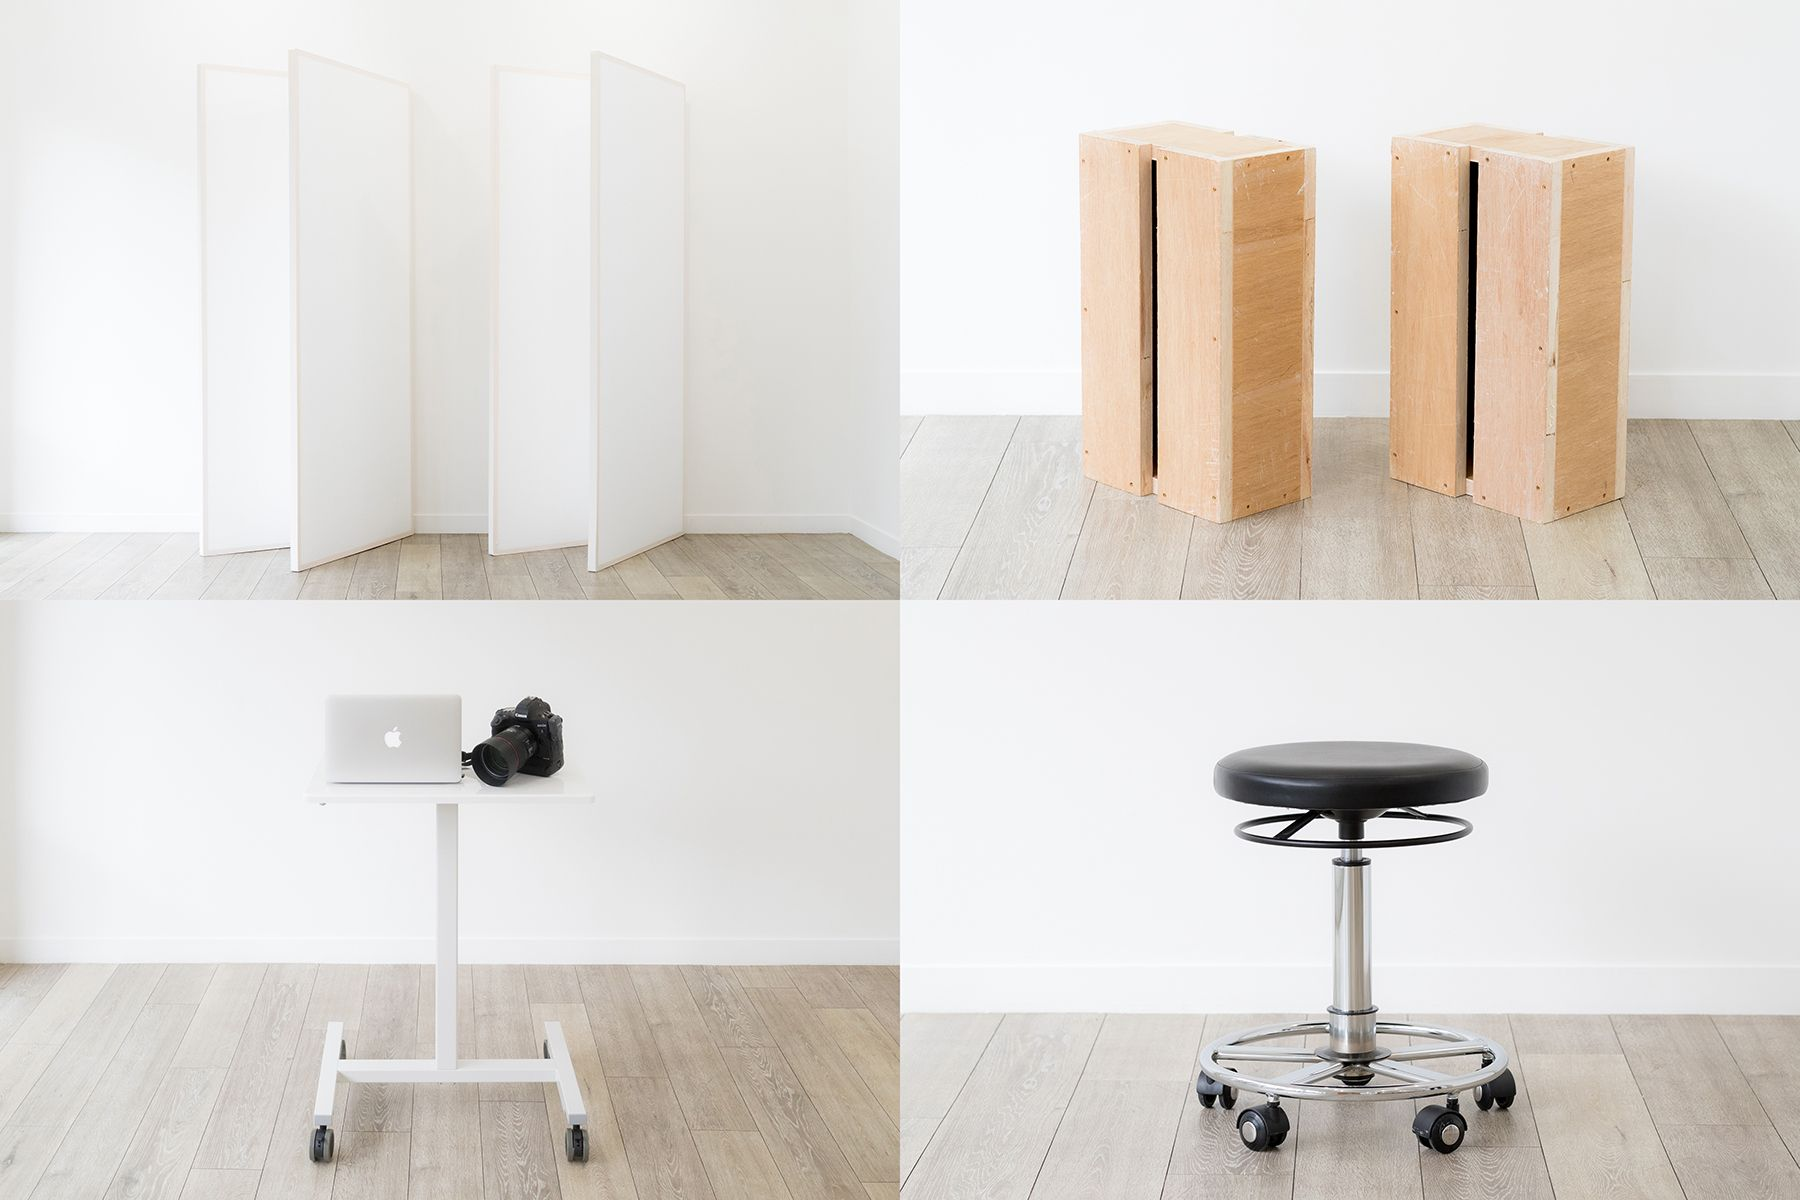 Studio Serato 代々木 (スタジオセラート代々木)無垢材のアンティークチェア